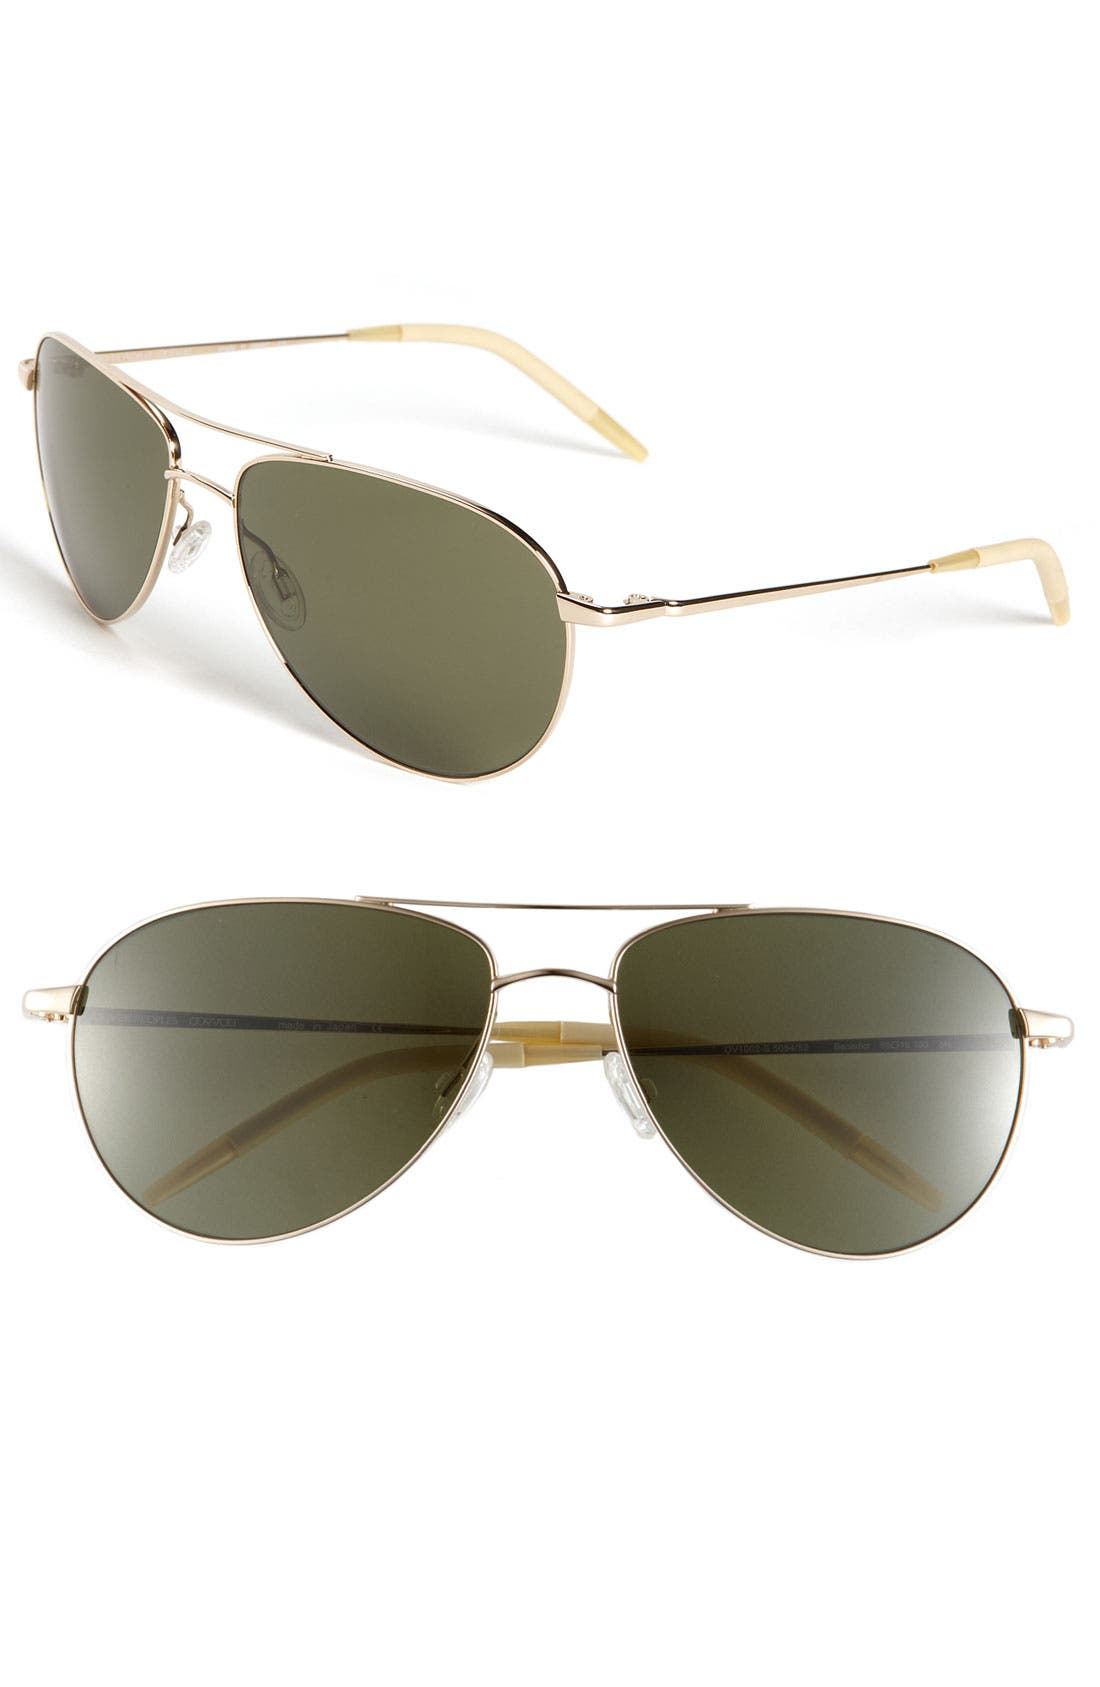 Main Image - Oliver Peoples 'Benedict' 59mm Aviator Sunglasses (Regular Retail Price: $350.00)